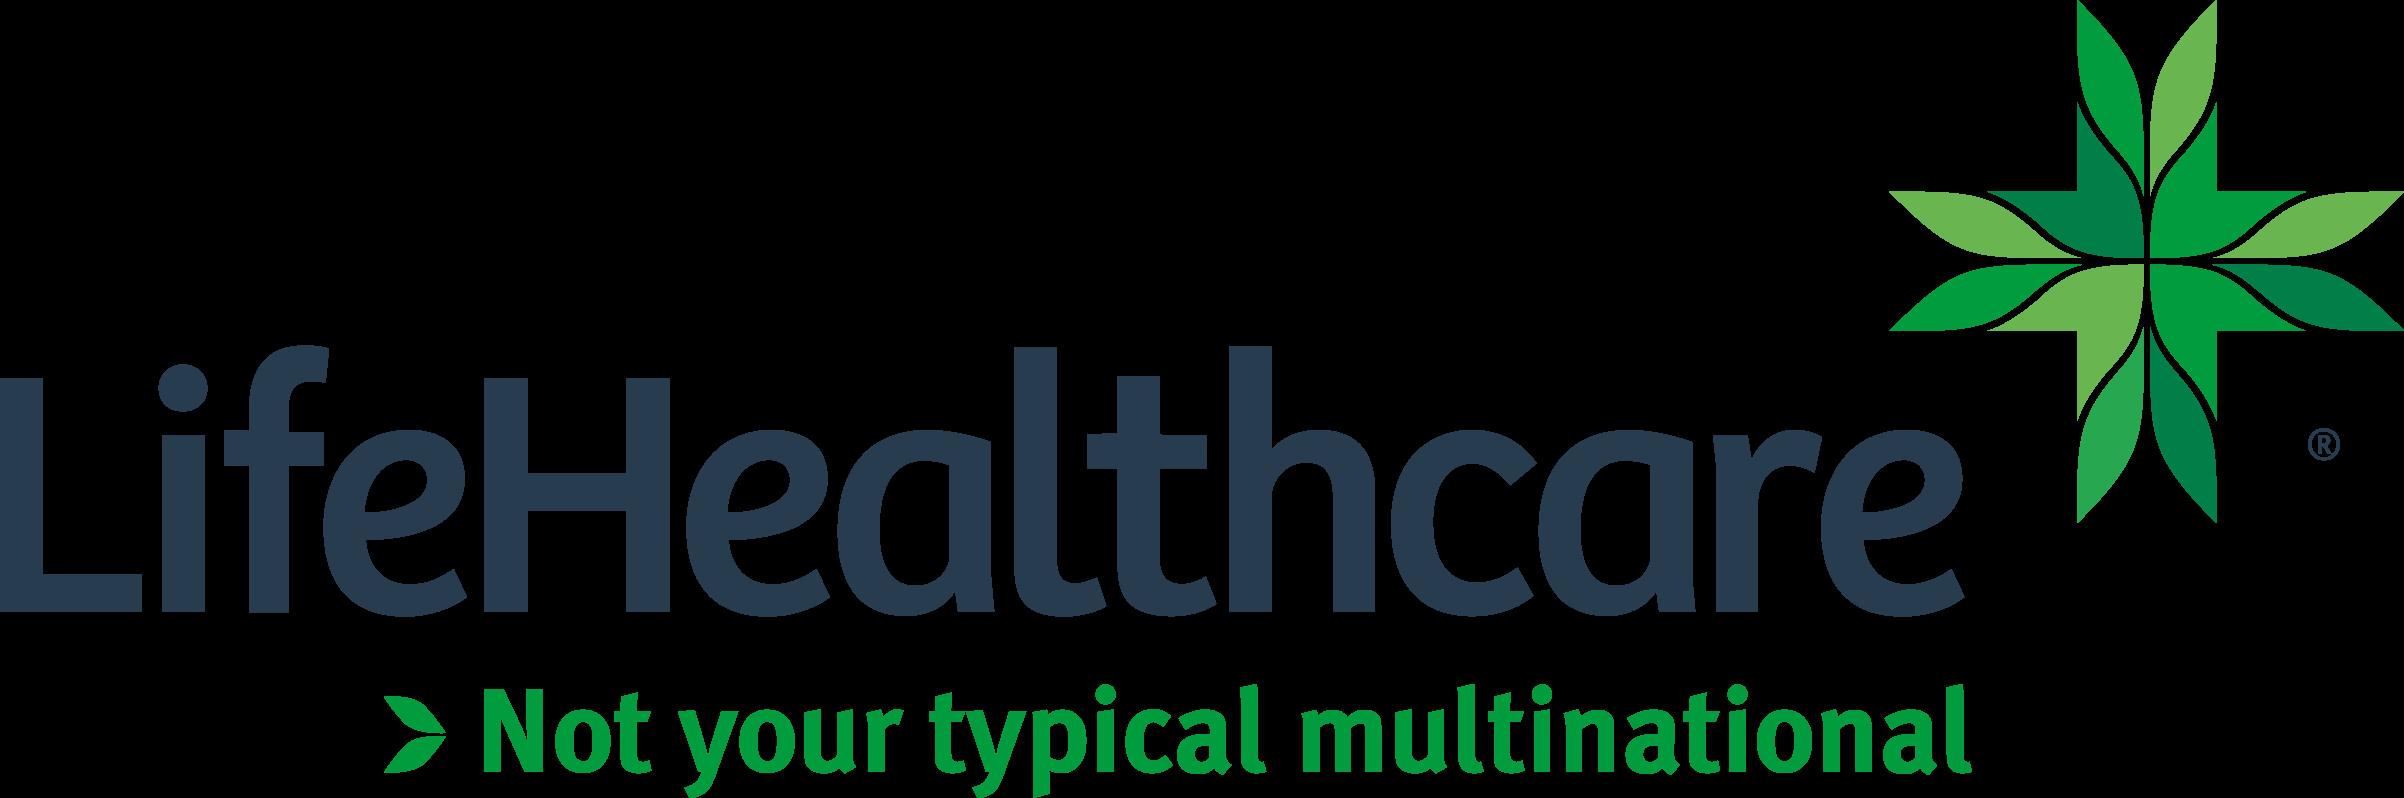 lifehealthcare-tag-colour (002)